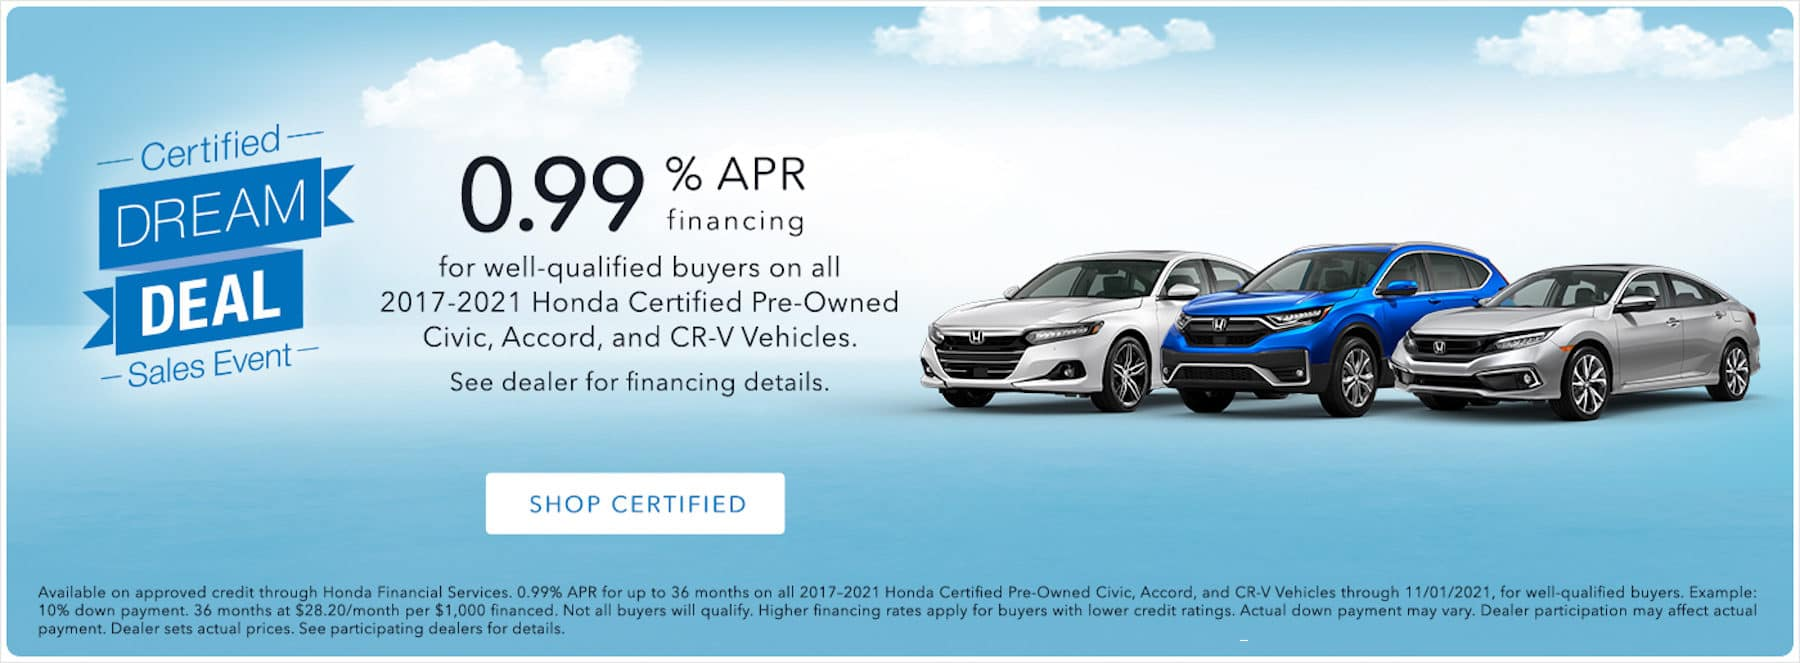 Honda Certified Dream Deal Sales Event